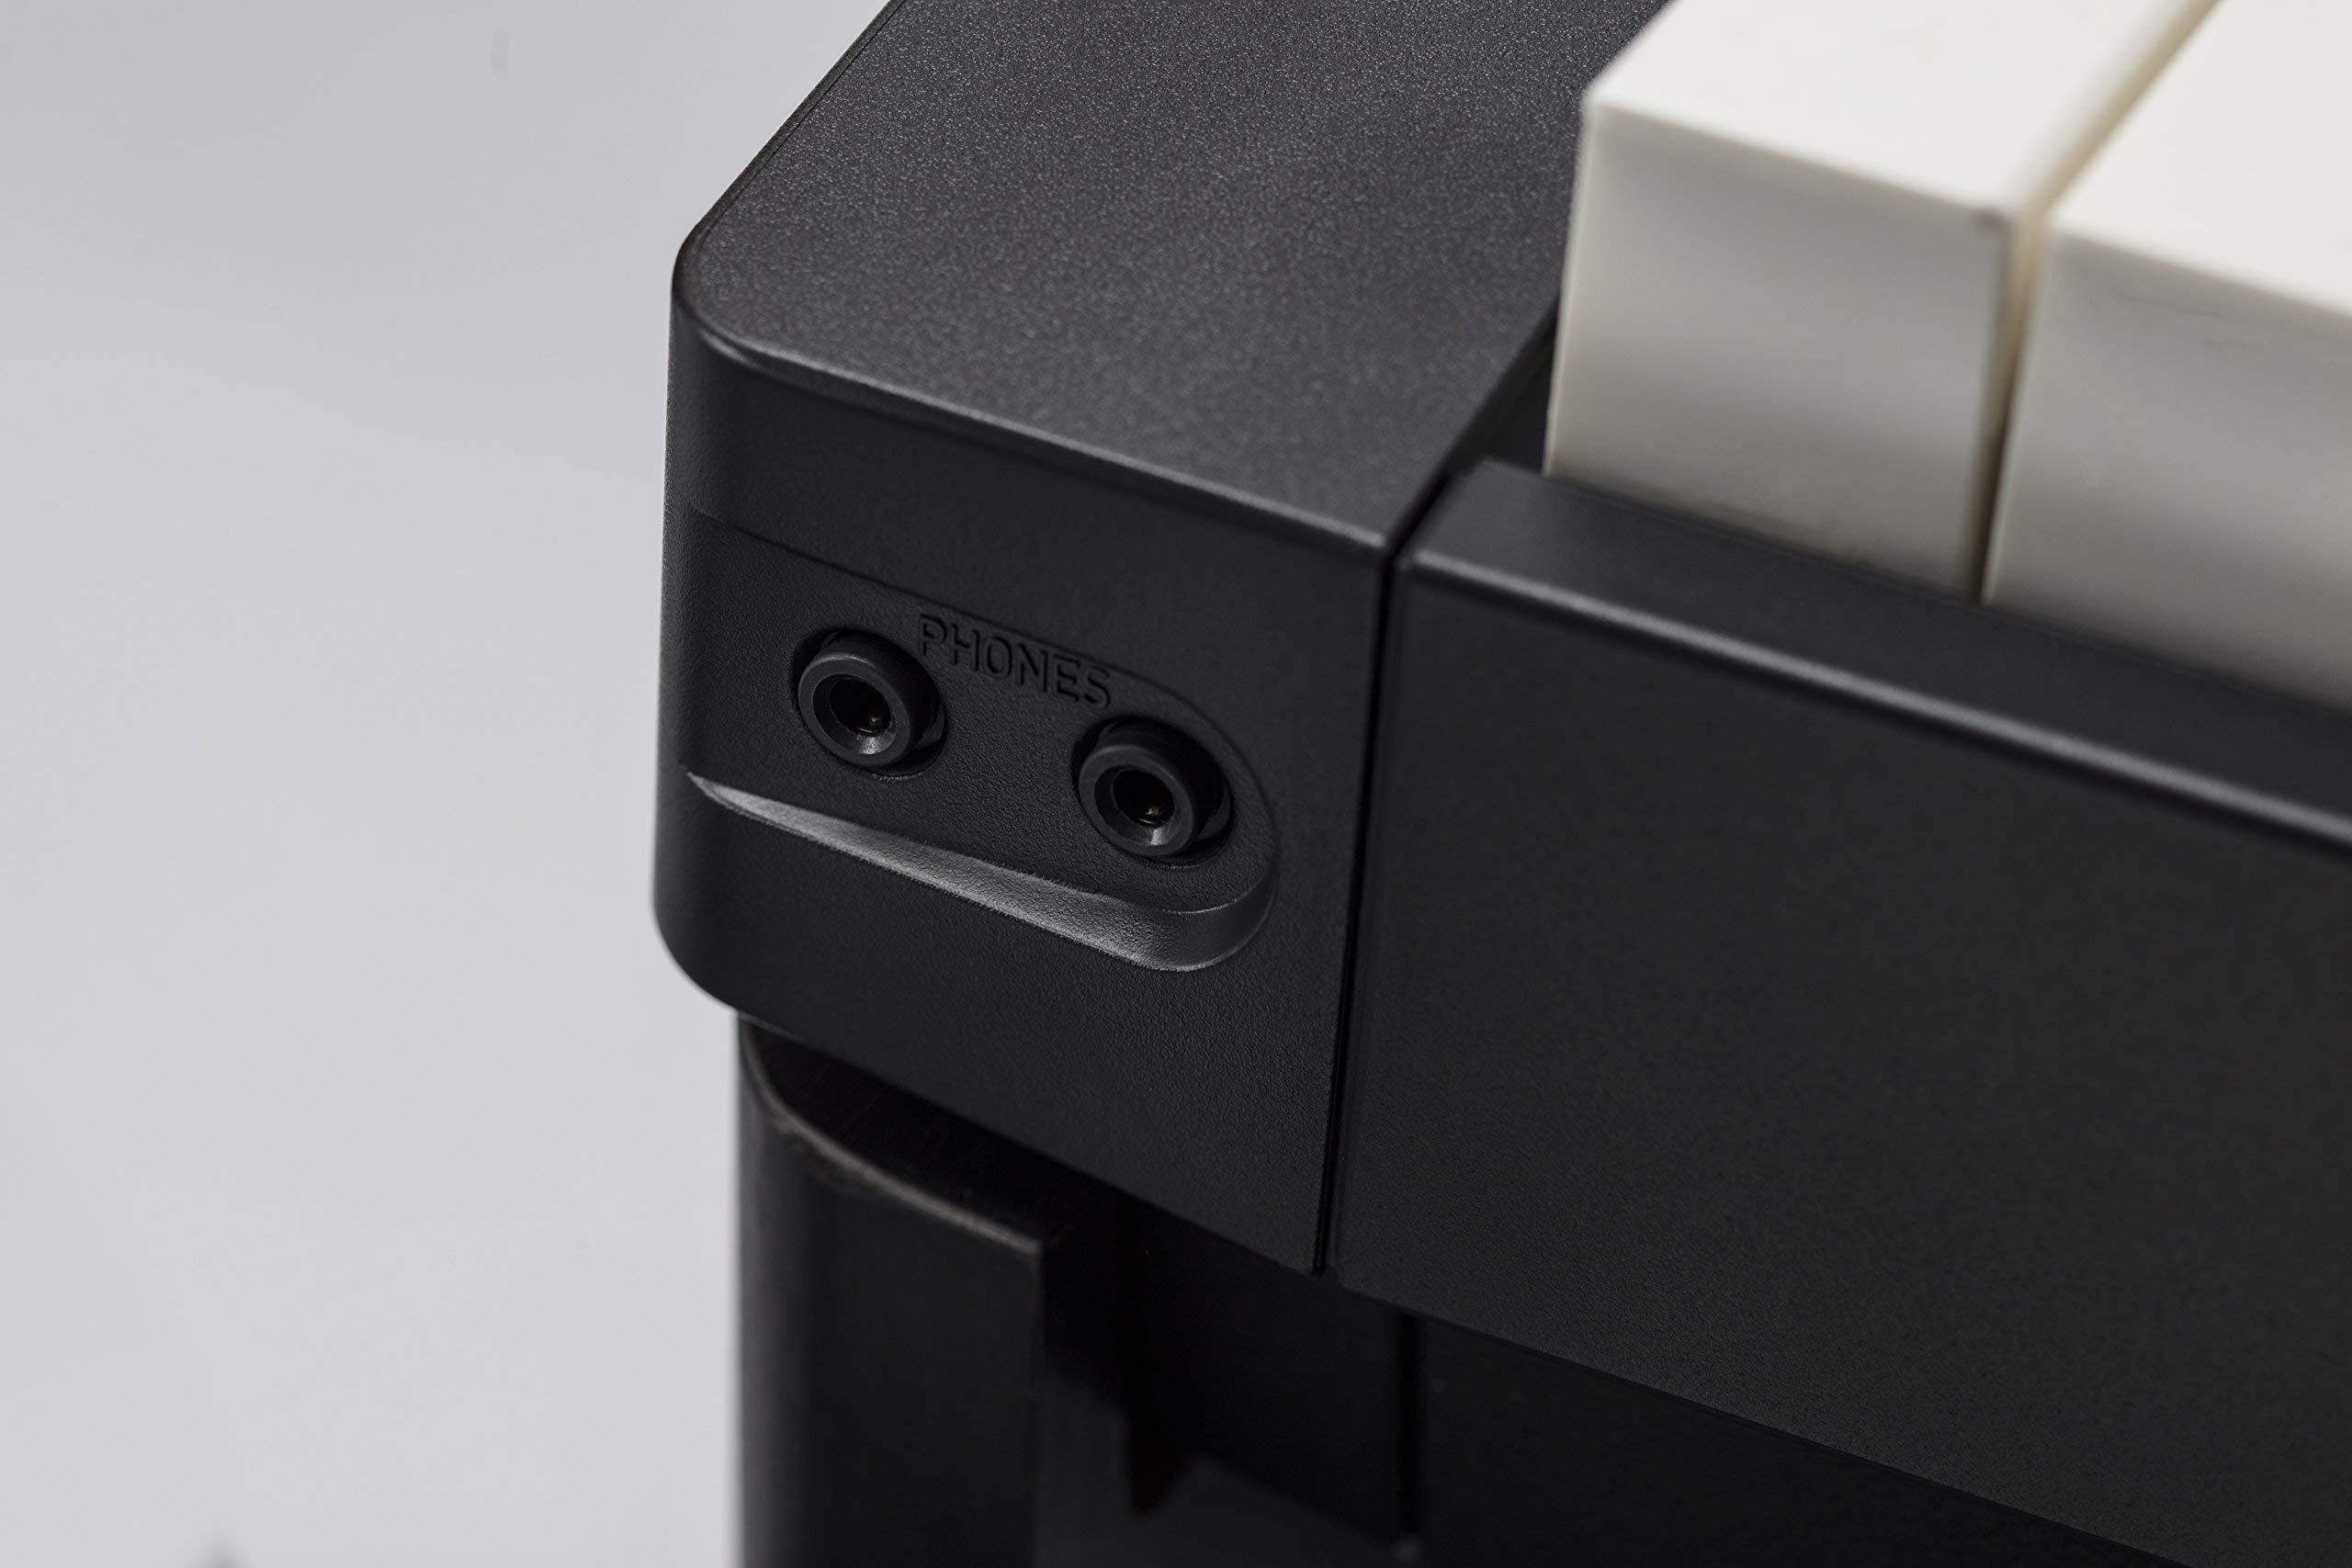 Casio Privia PX-160BK 88-Key Full Size Digital Piano with Power Supply, Black (Renewed) by Casio (Image #4)